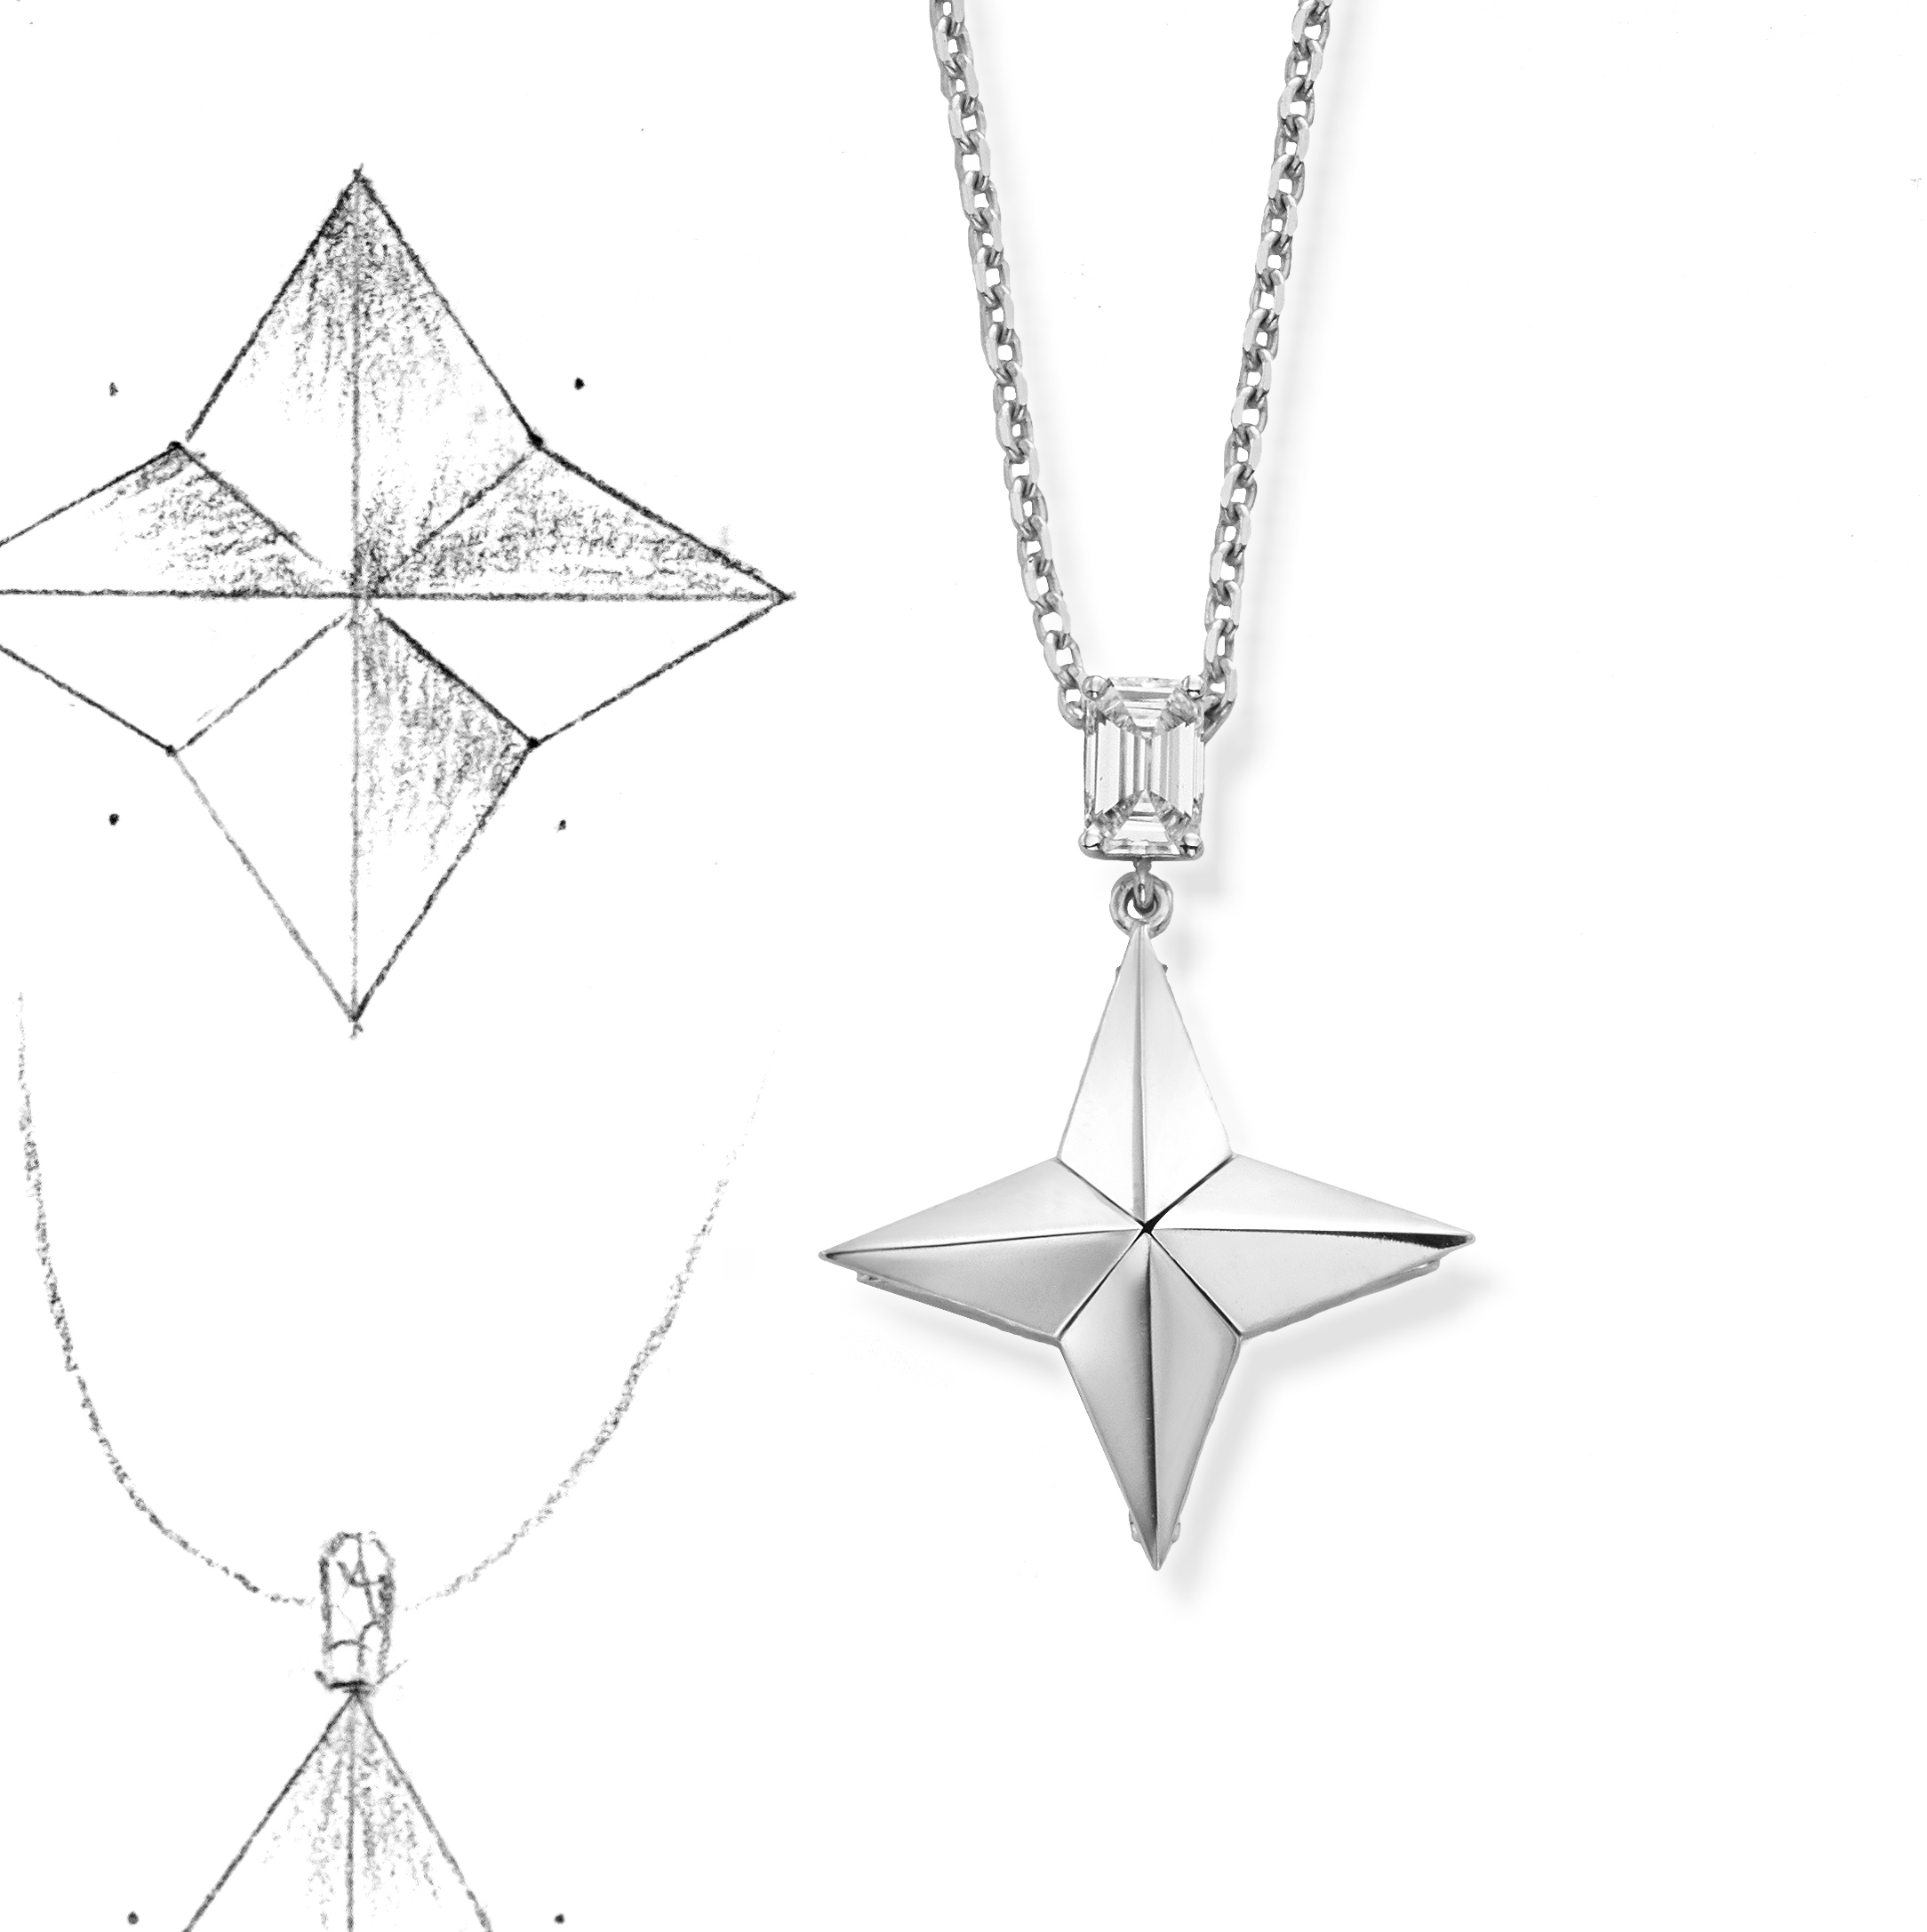 Origami sketch.jpg